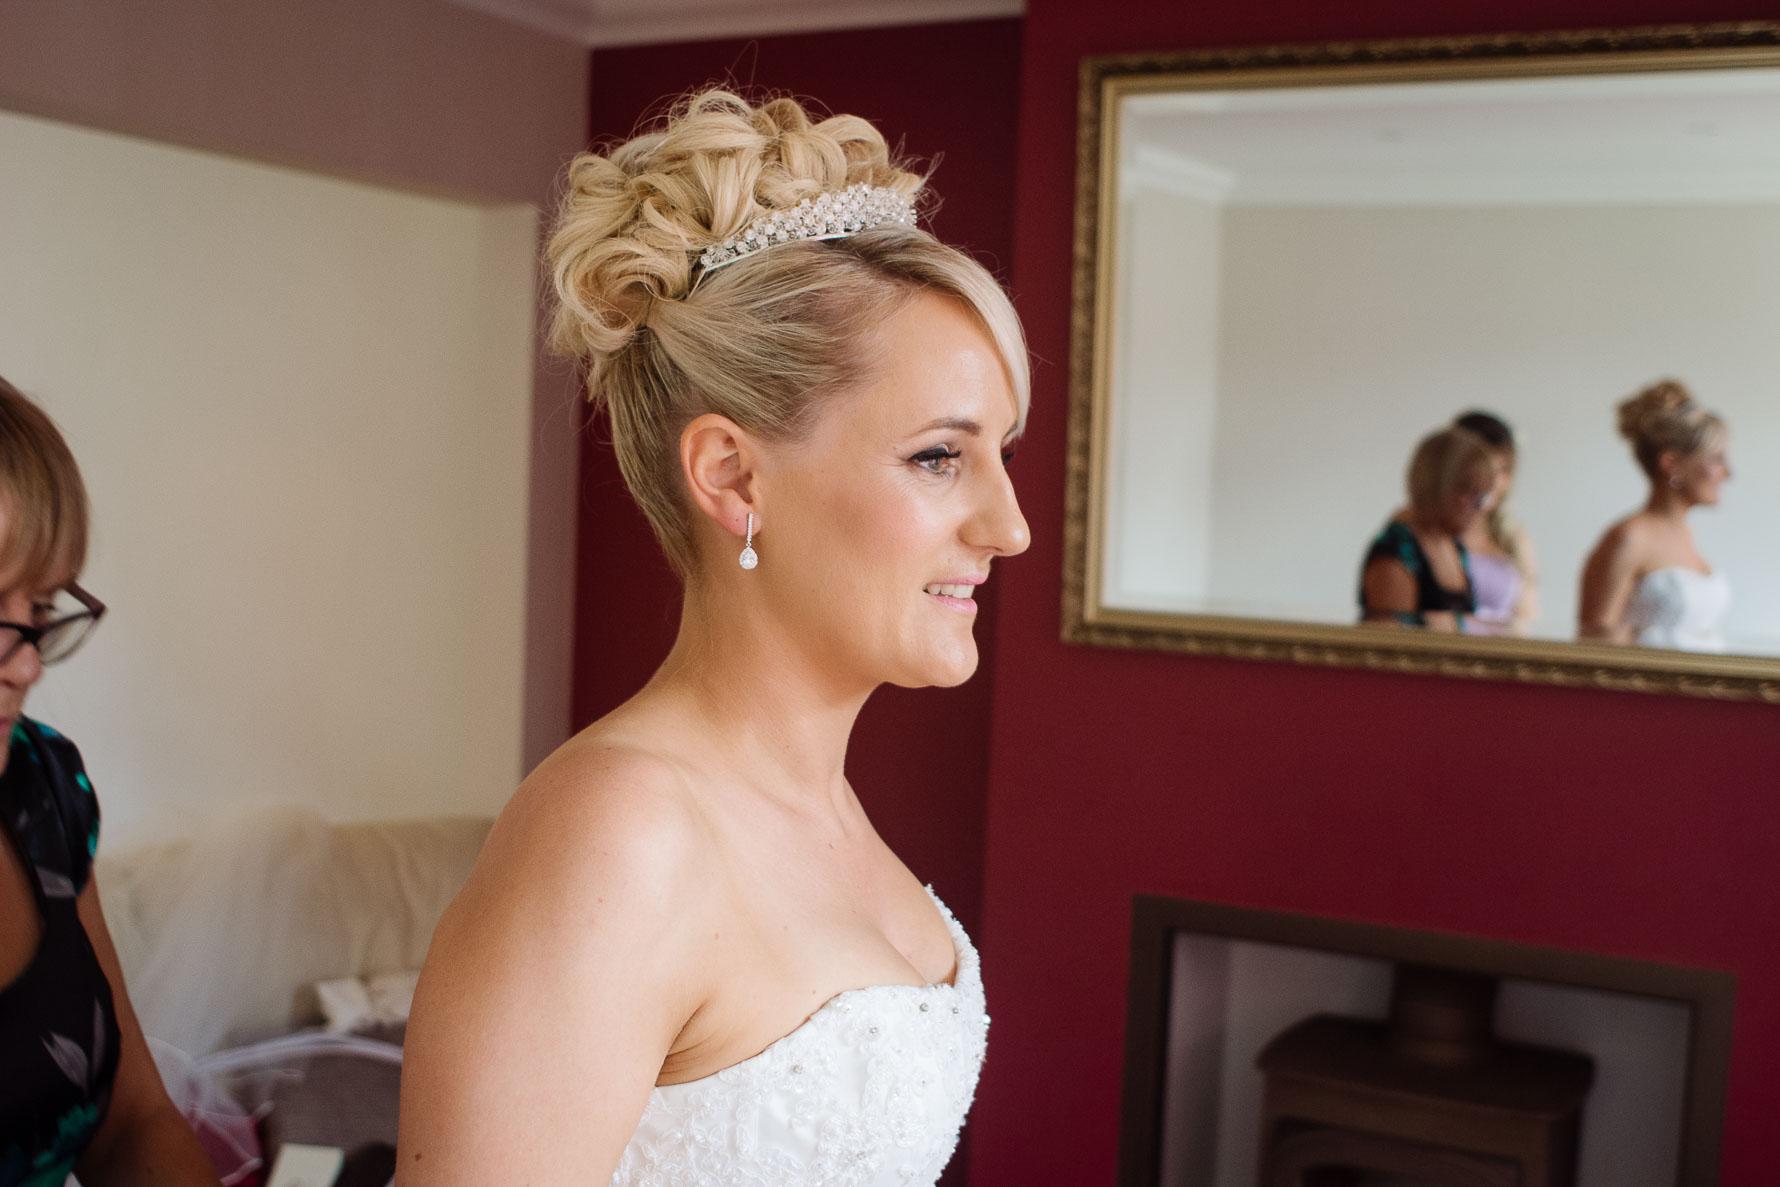 Canterbury Cathedral Lodge Wedding17-20141004 0316